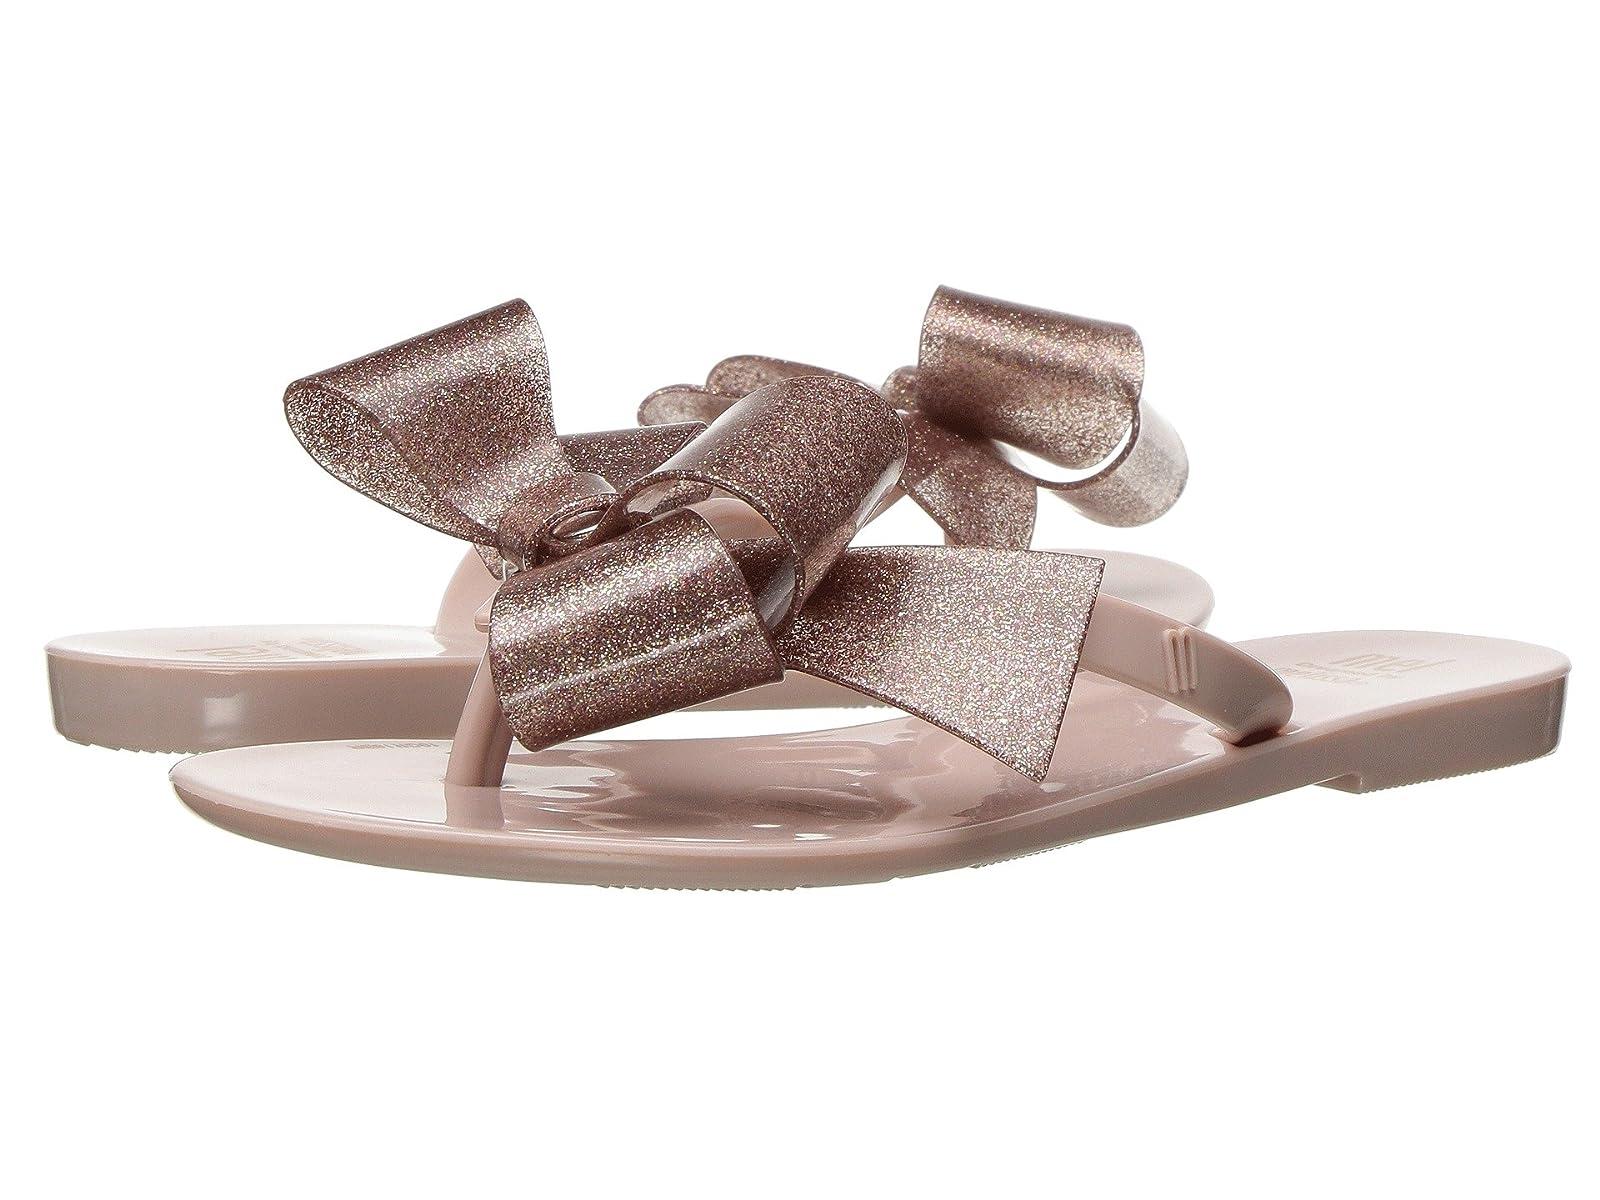 Mini Melissa Mel Harmonic Bow III (Little Kid)Atmospheric grades have affordable shoes